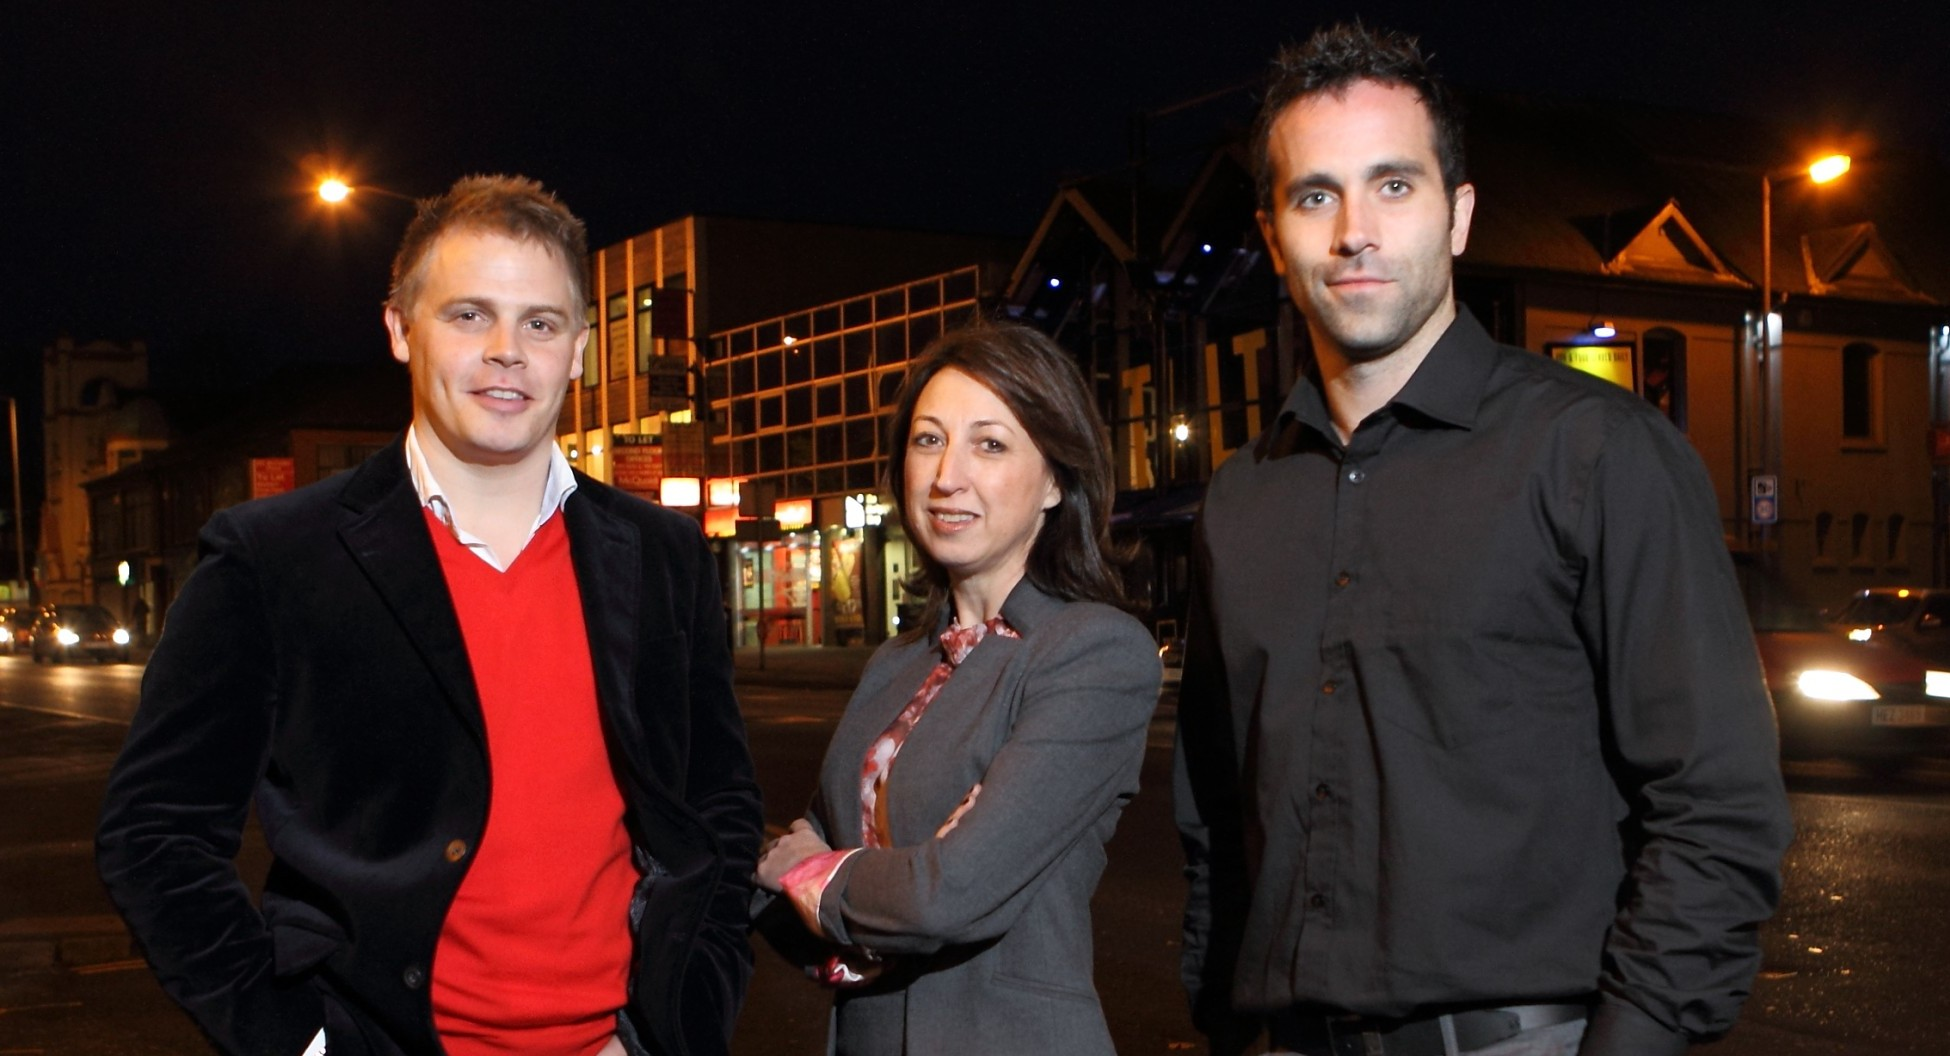 Ormeau businesses unite for a bright future